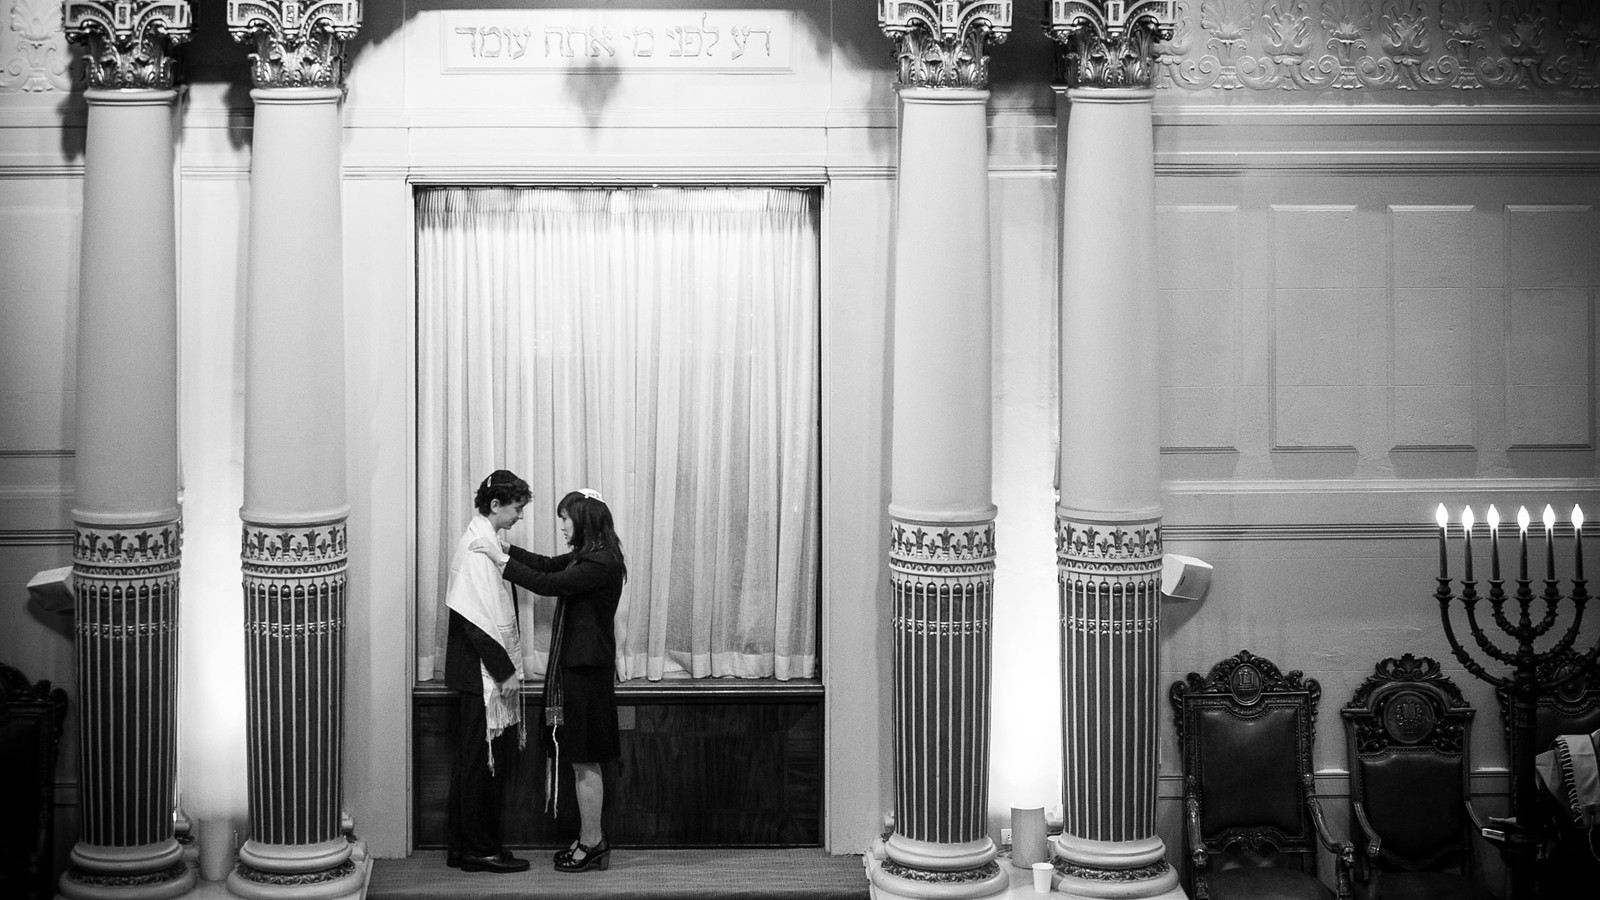 00124_20141115120537_San_Francisco_Wedding_Photographer_Sees_The_Day-X3.jpg